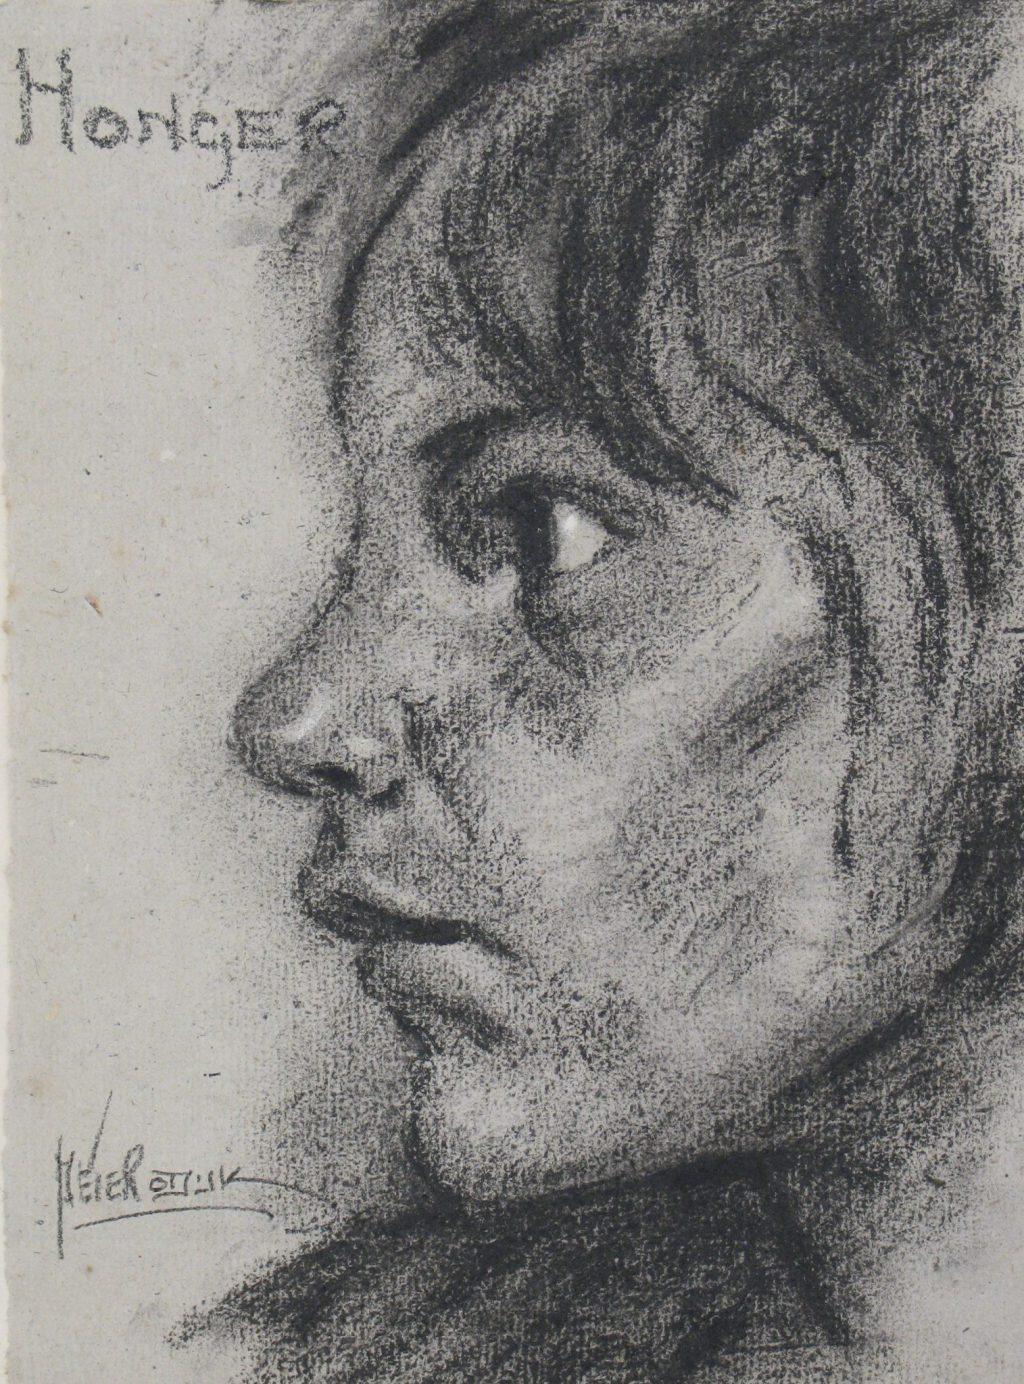 Peter Odijk, 'Honger', 1944-1945 (TMS 123142)